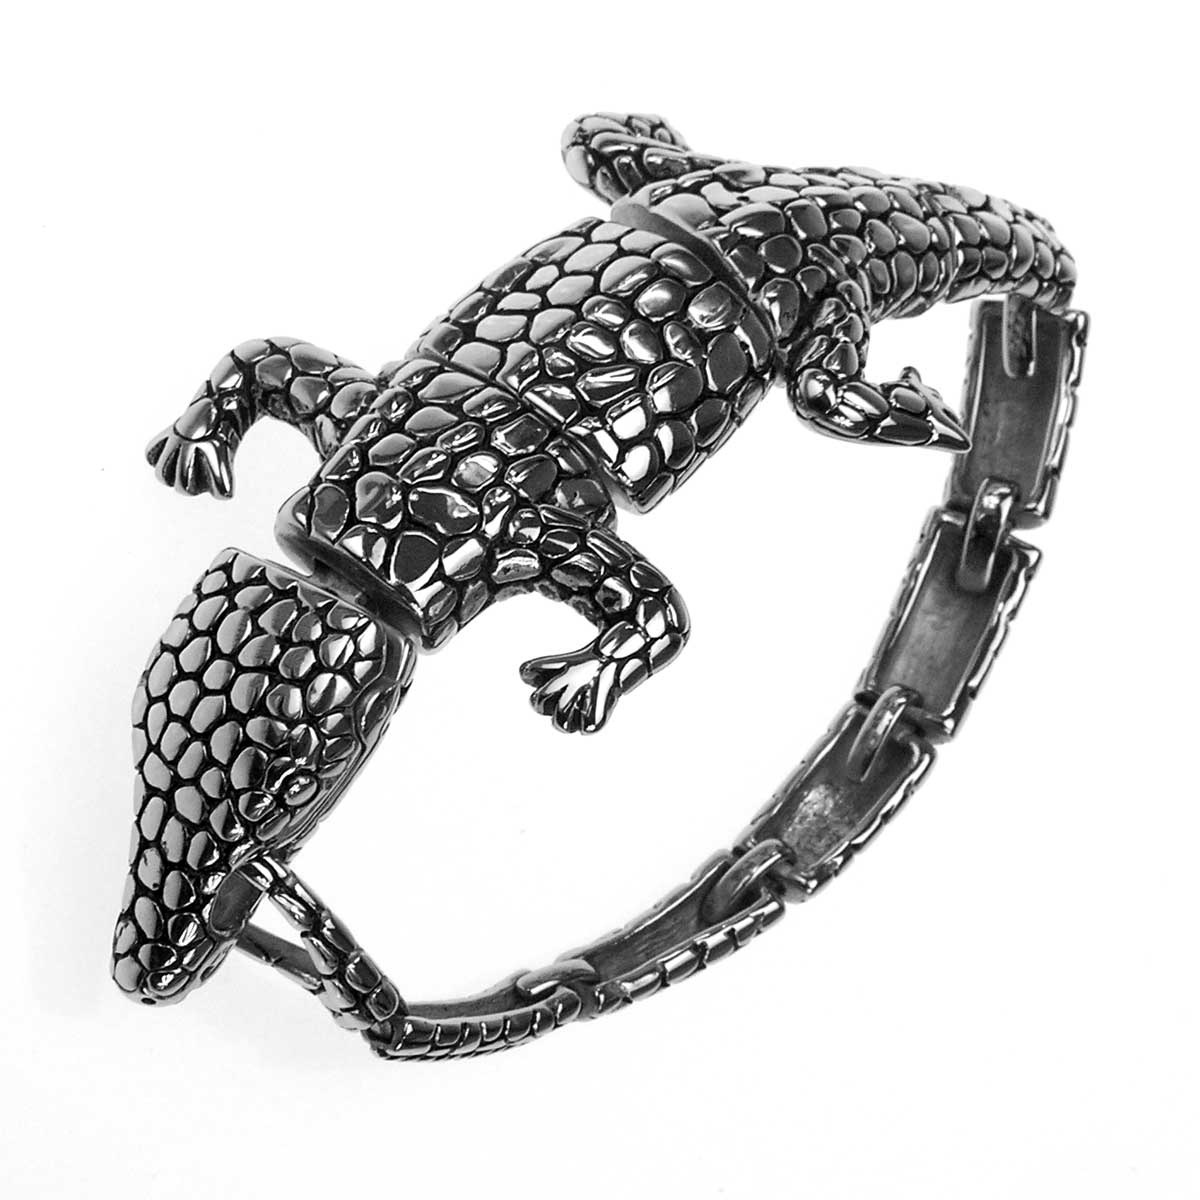 Edelstahl Armband als Krokodil sehr schön!